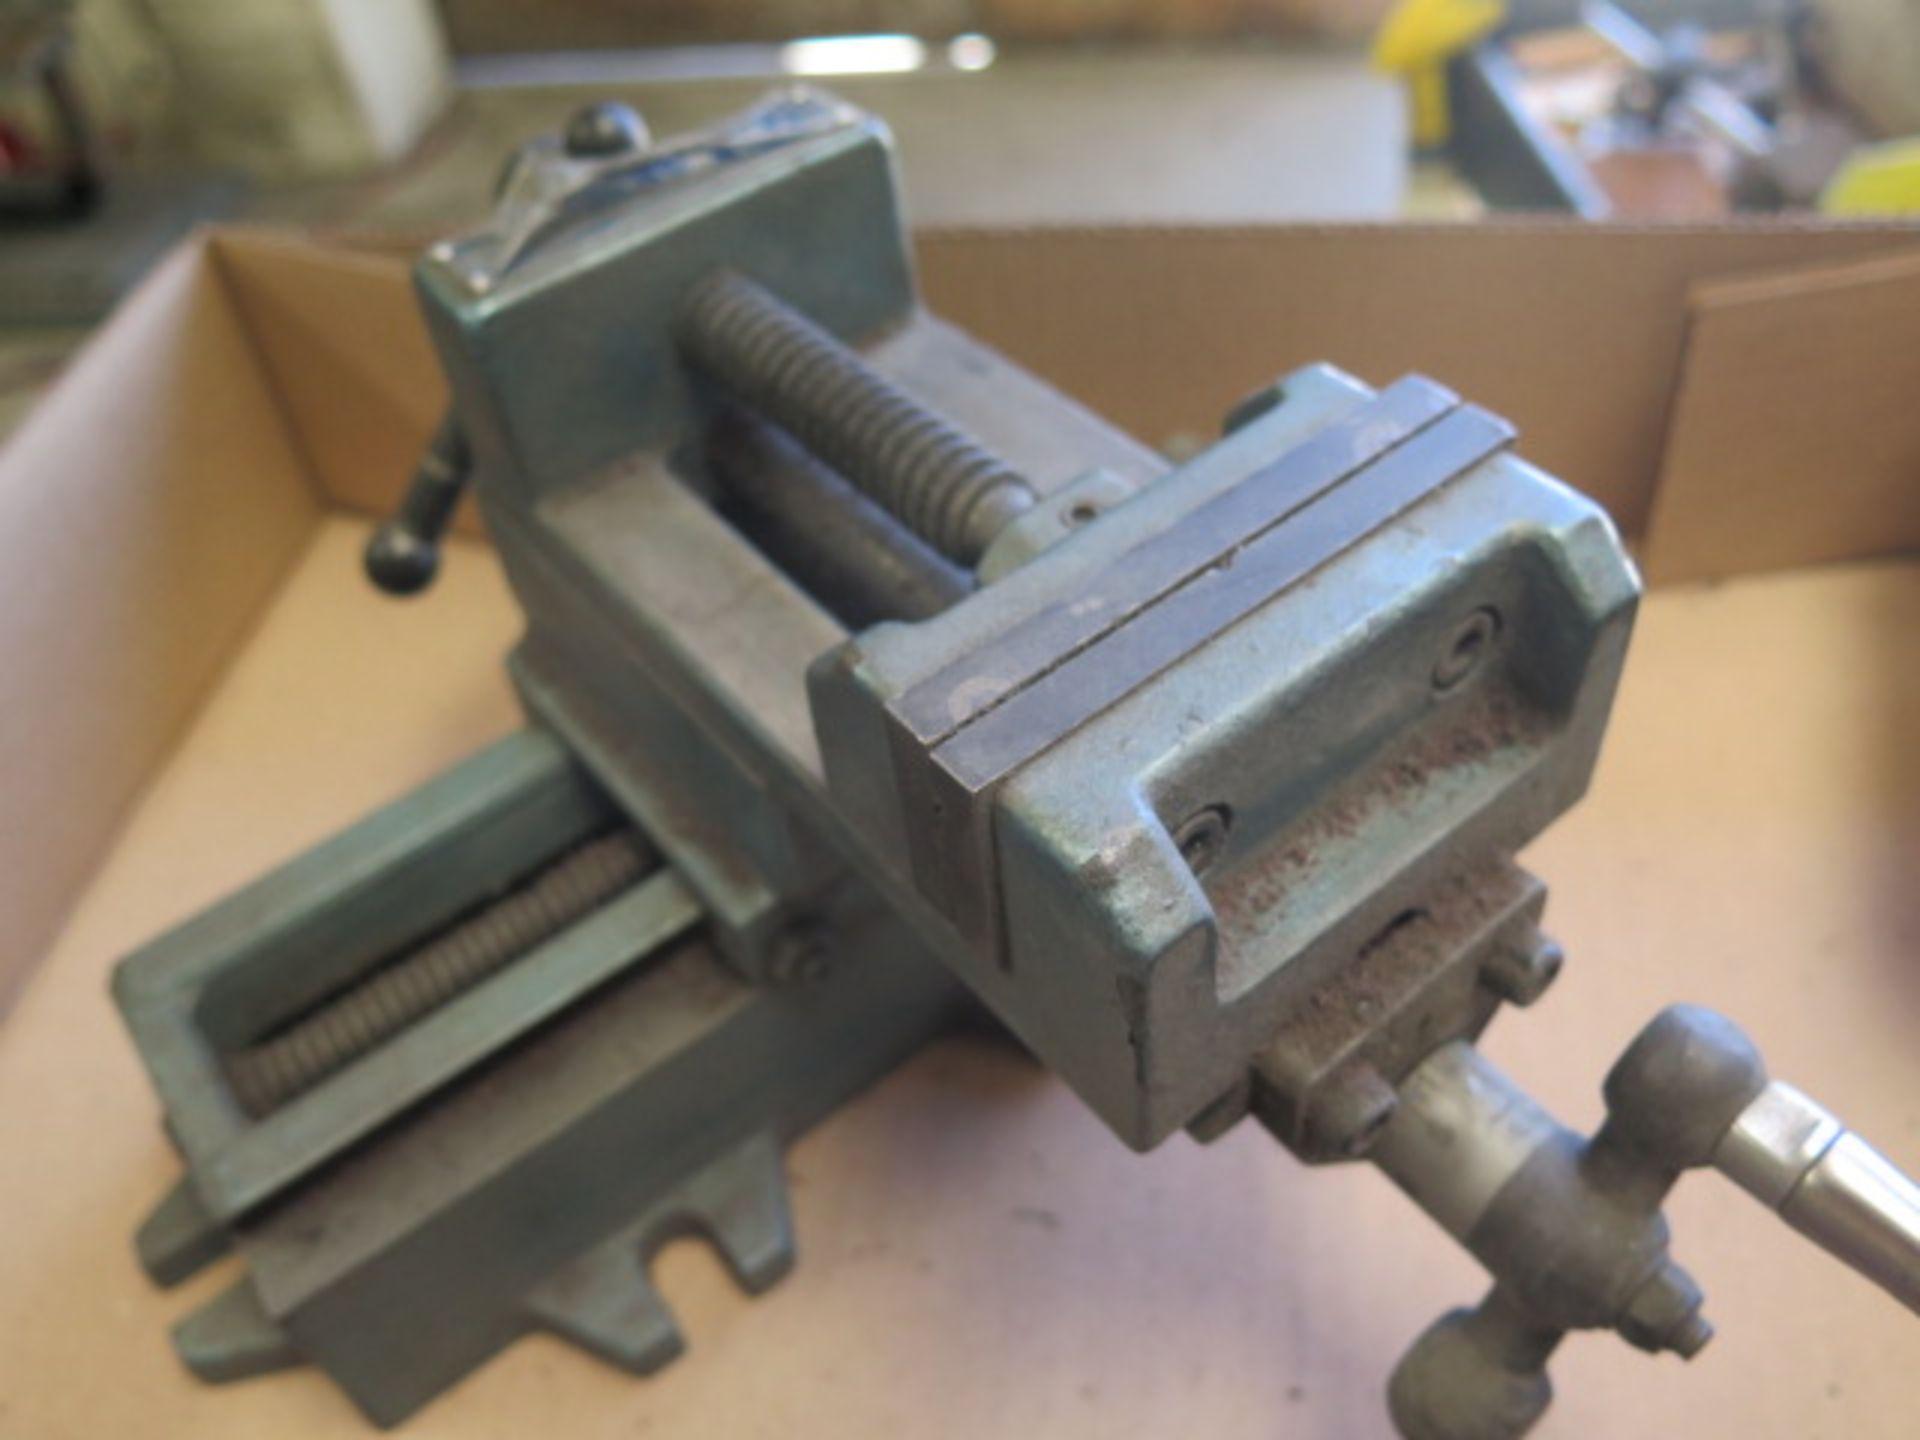 Wilton Cross Slide Vise (SOLD AS-IS - NO WARRANTY) - Image 3 of 6